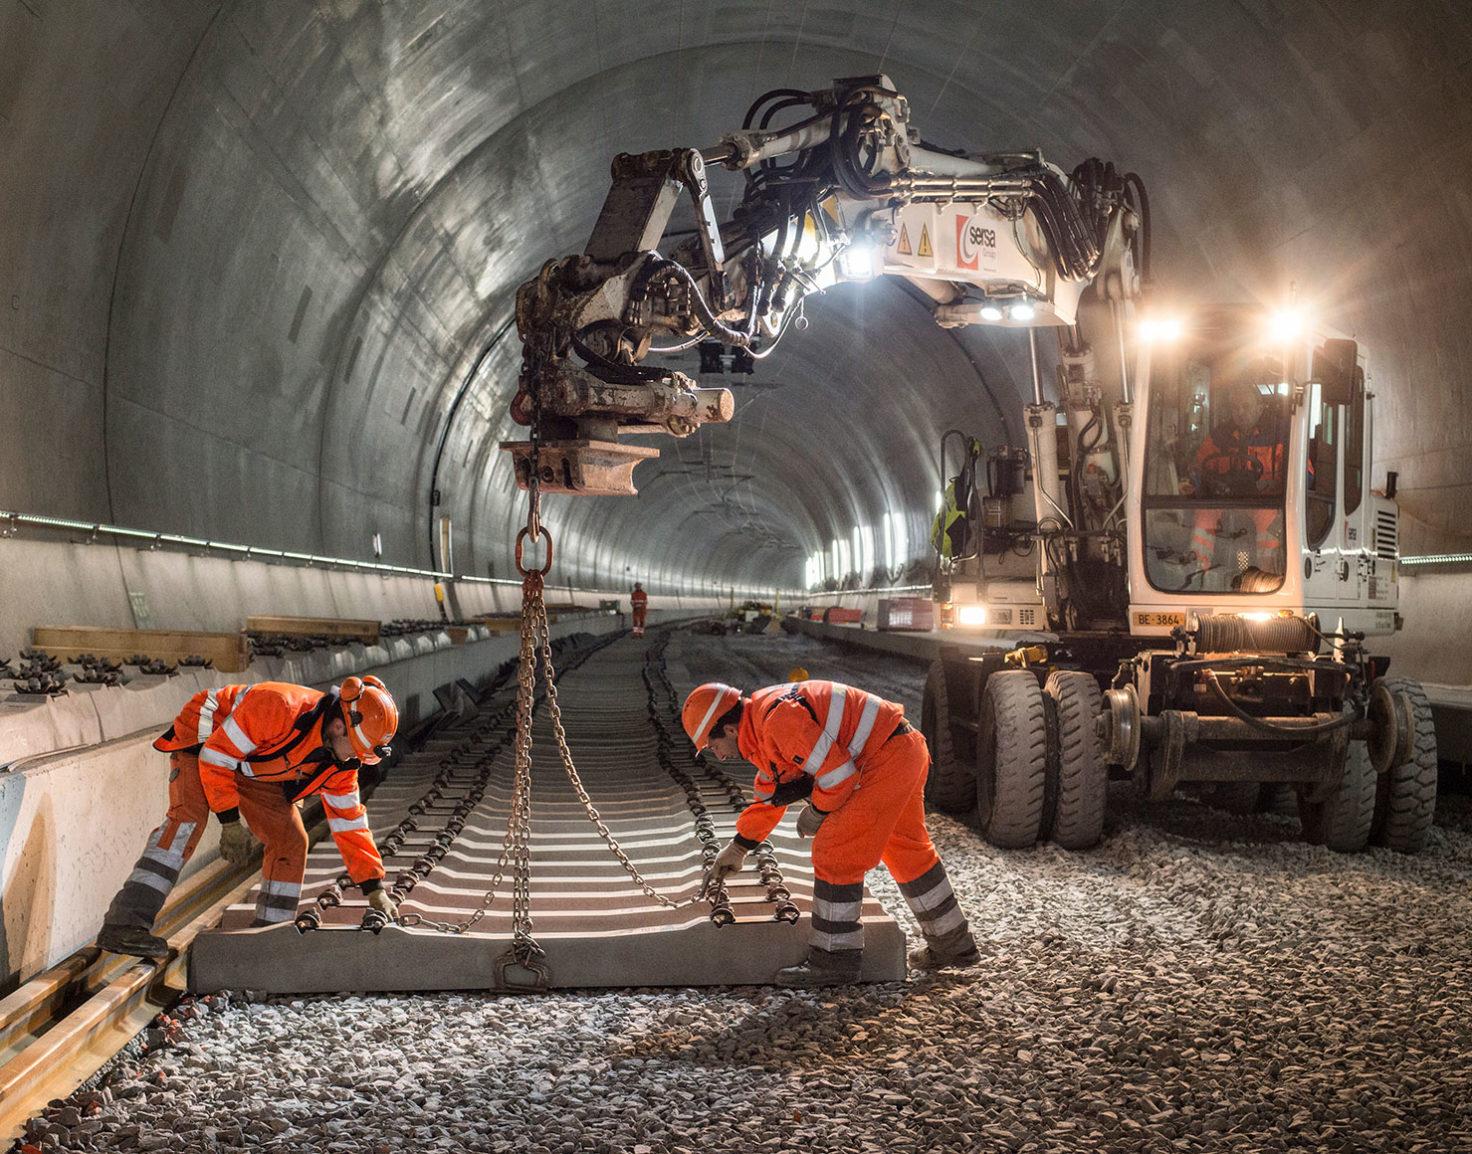 BLS_Rosshaeuserntunnel_1480x1160